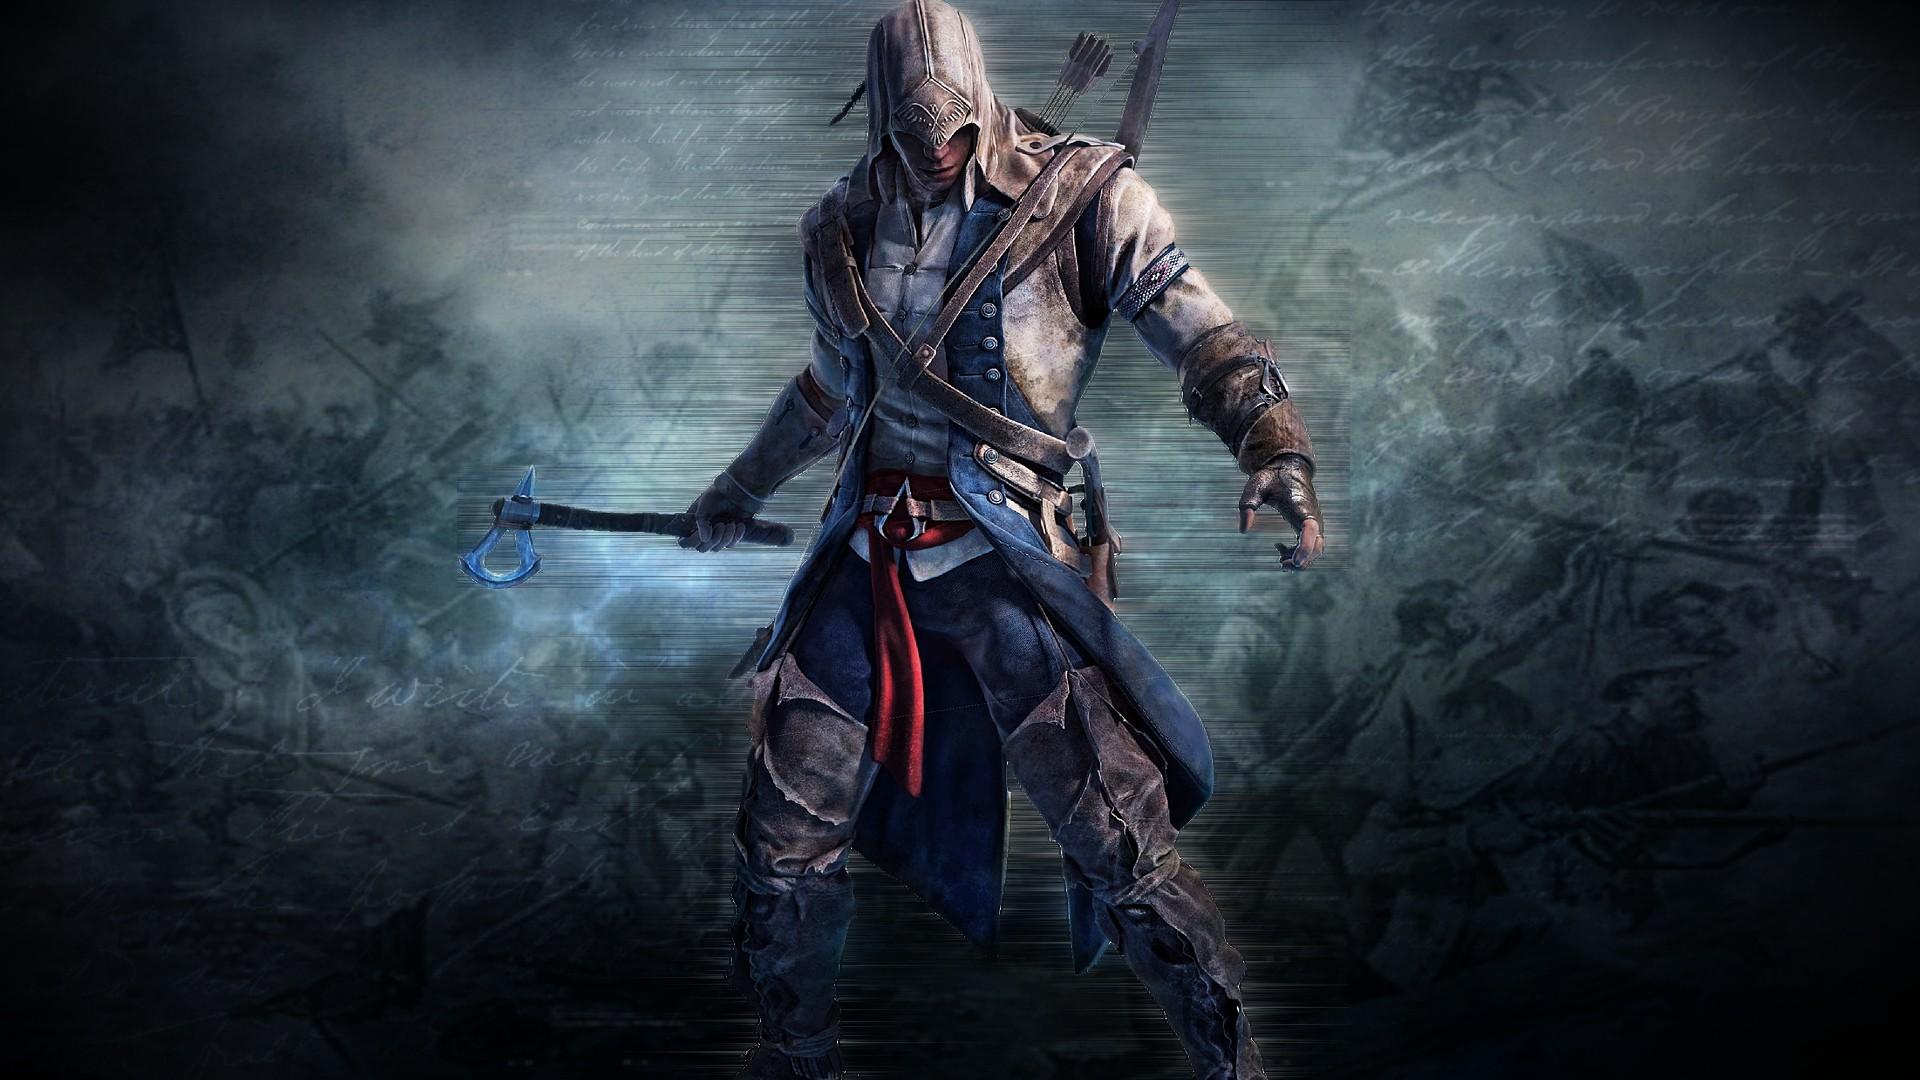 Assassins Creed 3 Wallpaper Hd 175132 1920x1080